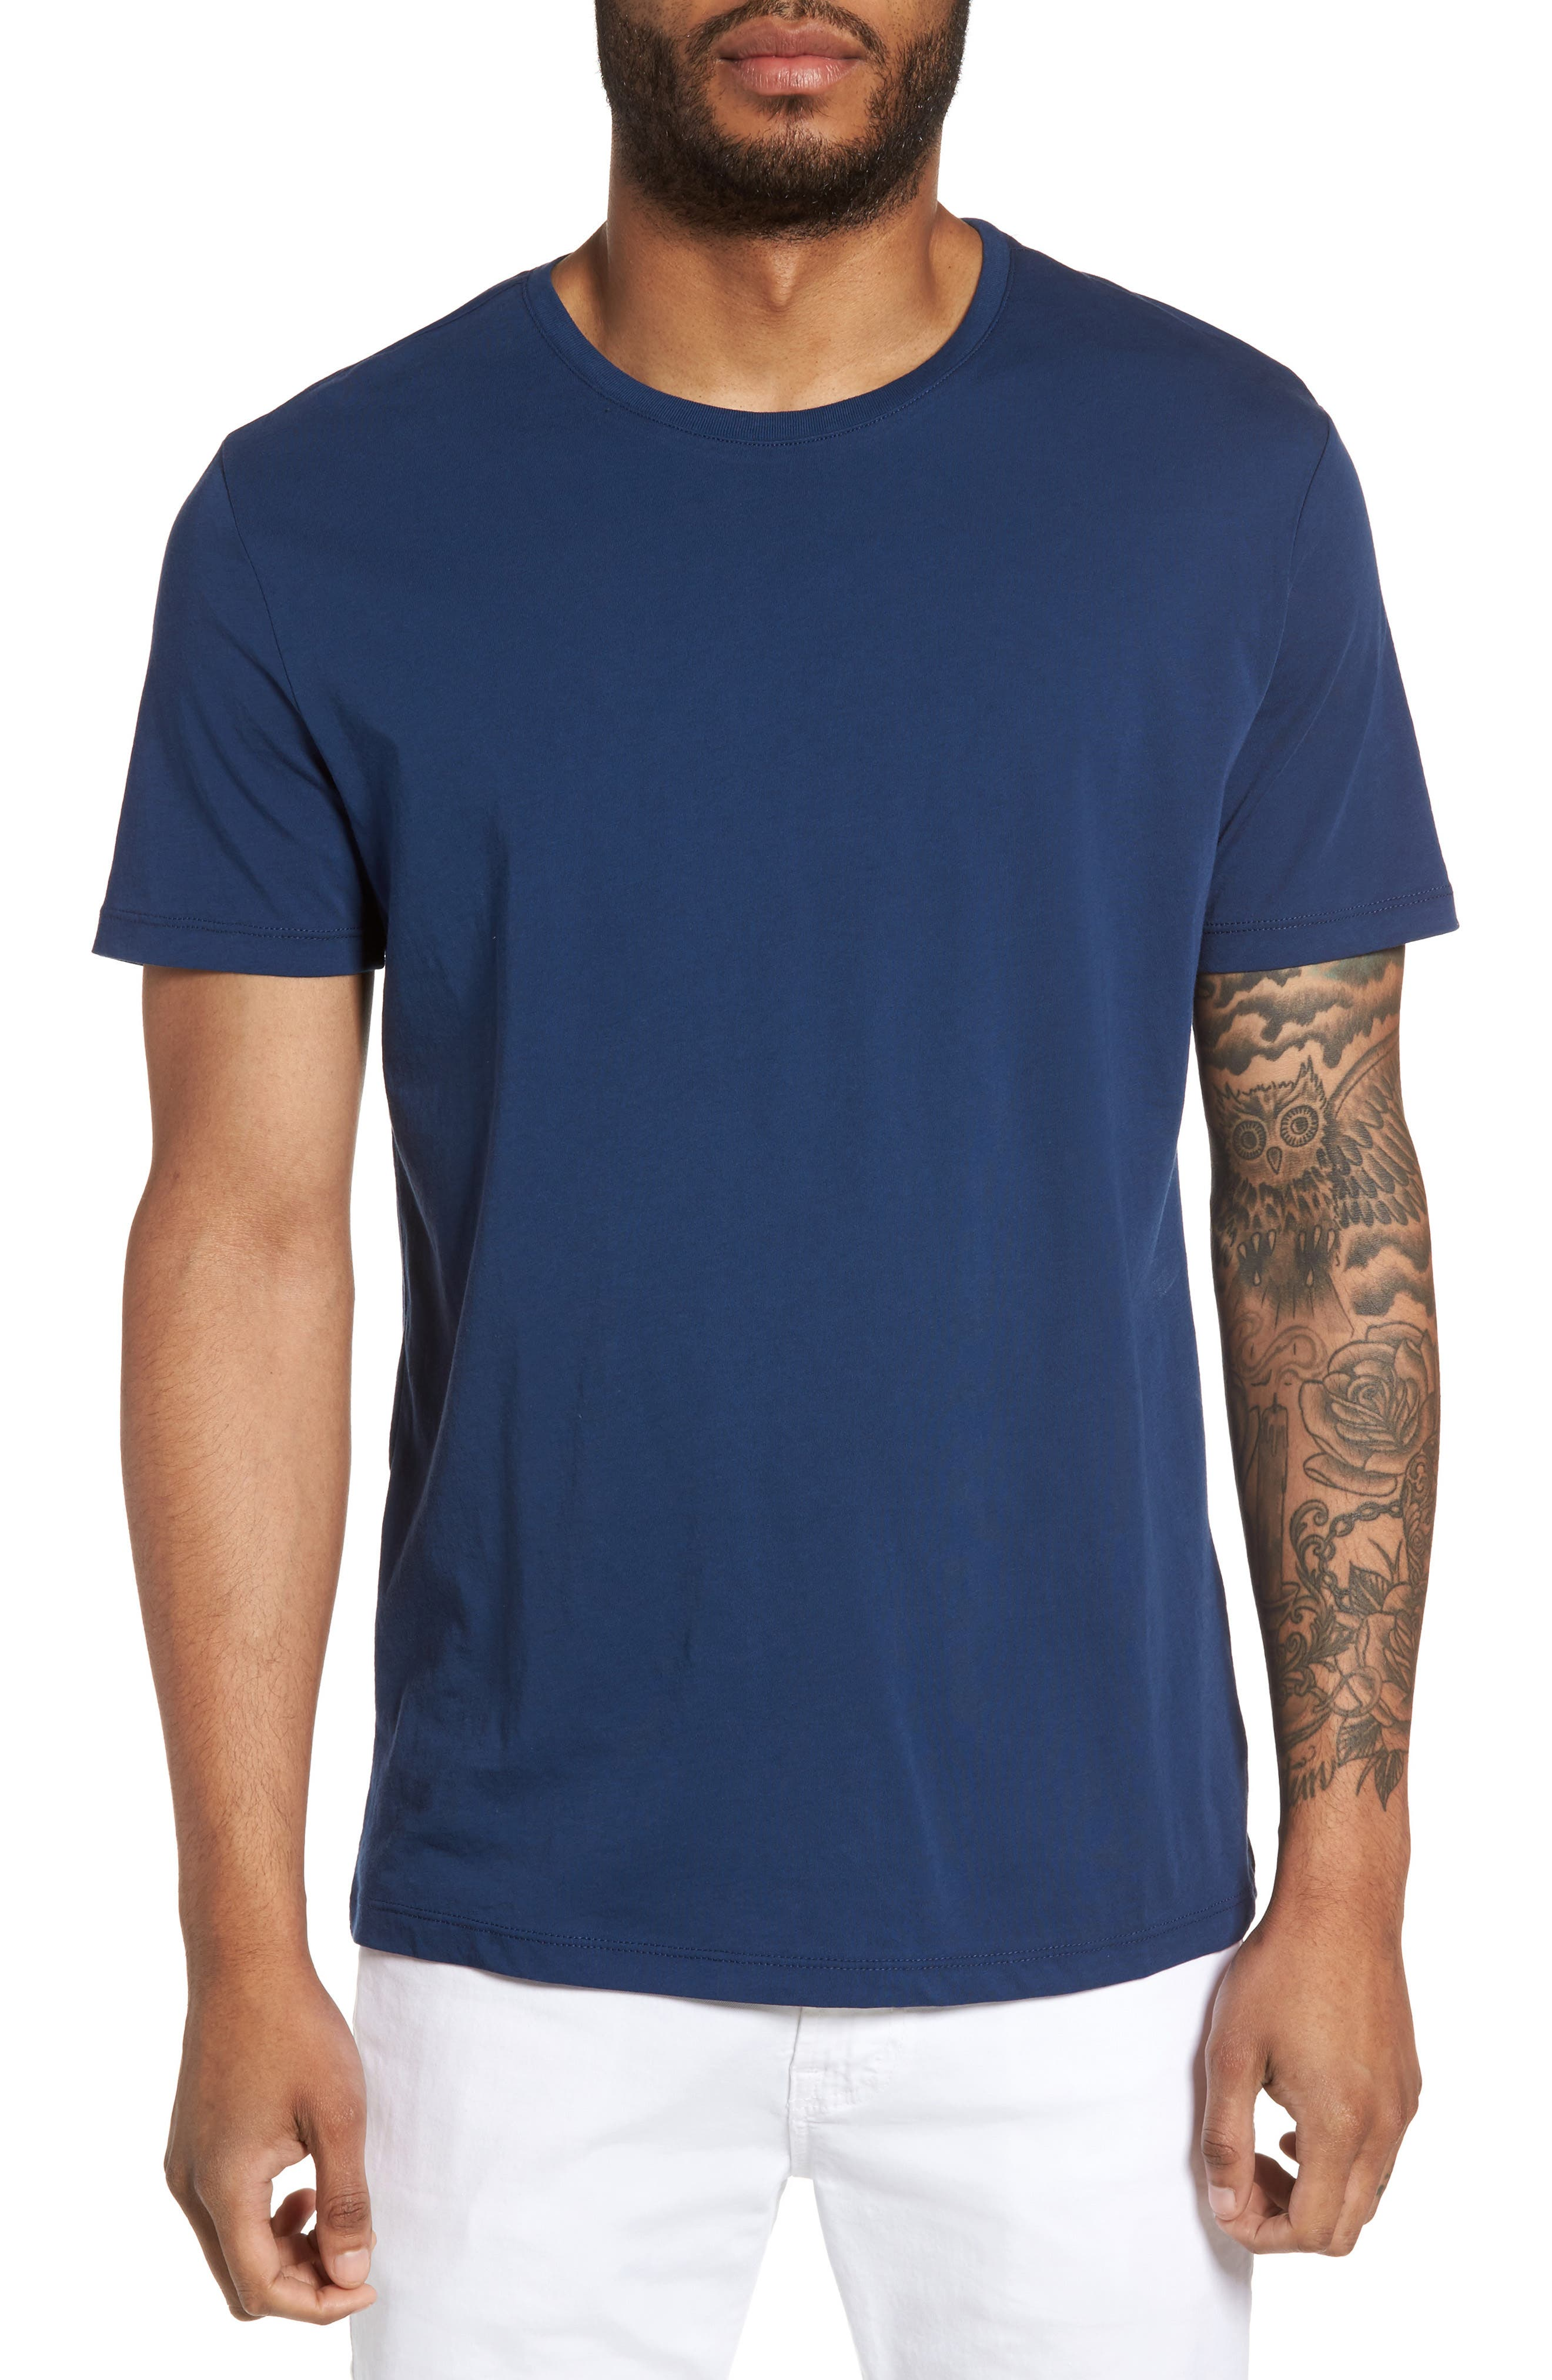 Alternate Image 1 Selected - Slate & Stone Slim Crewneck T-Shirt